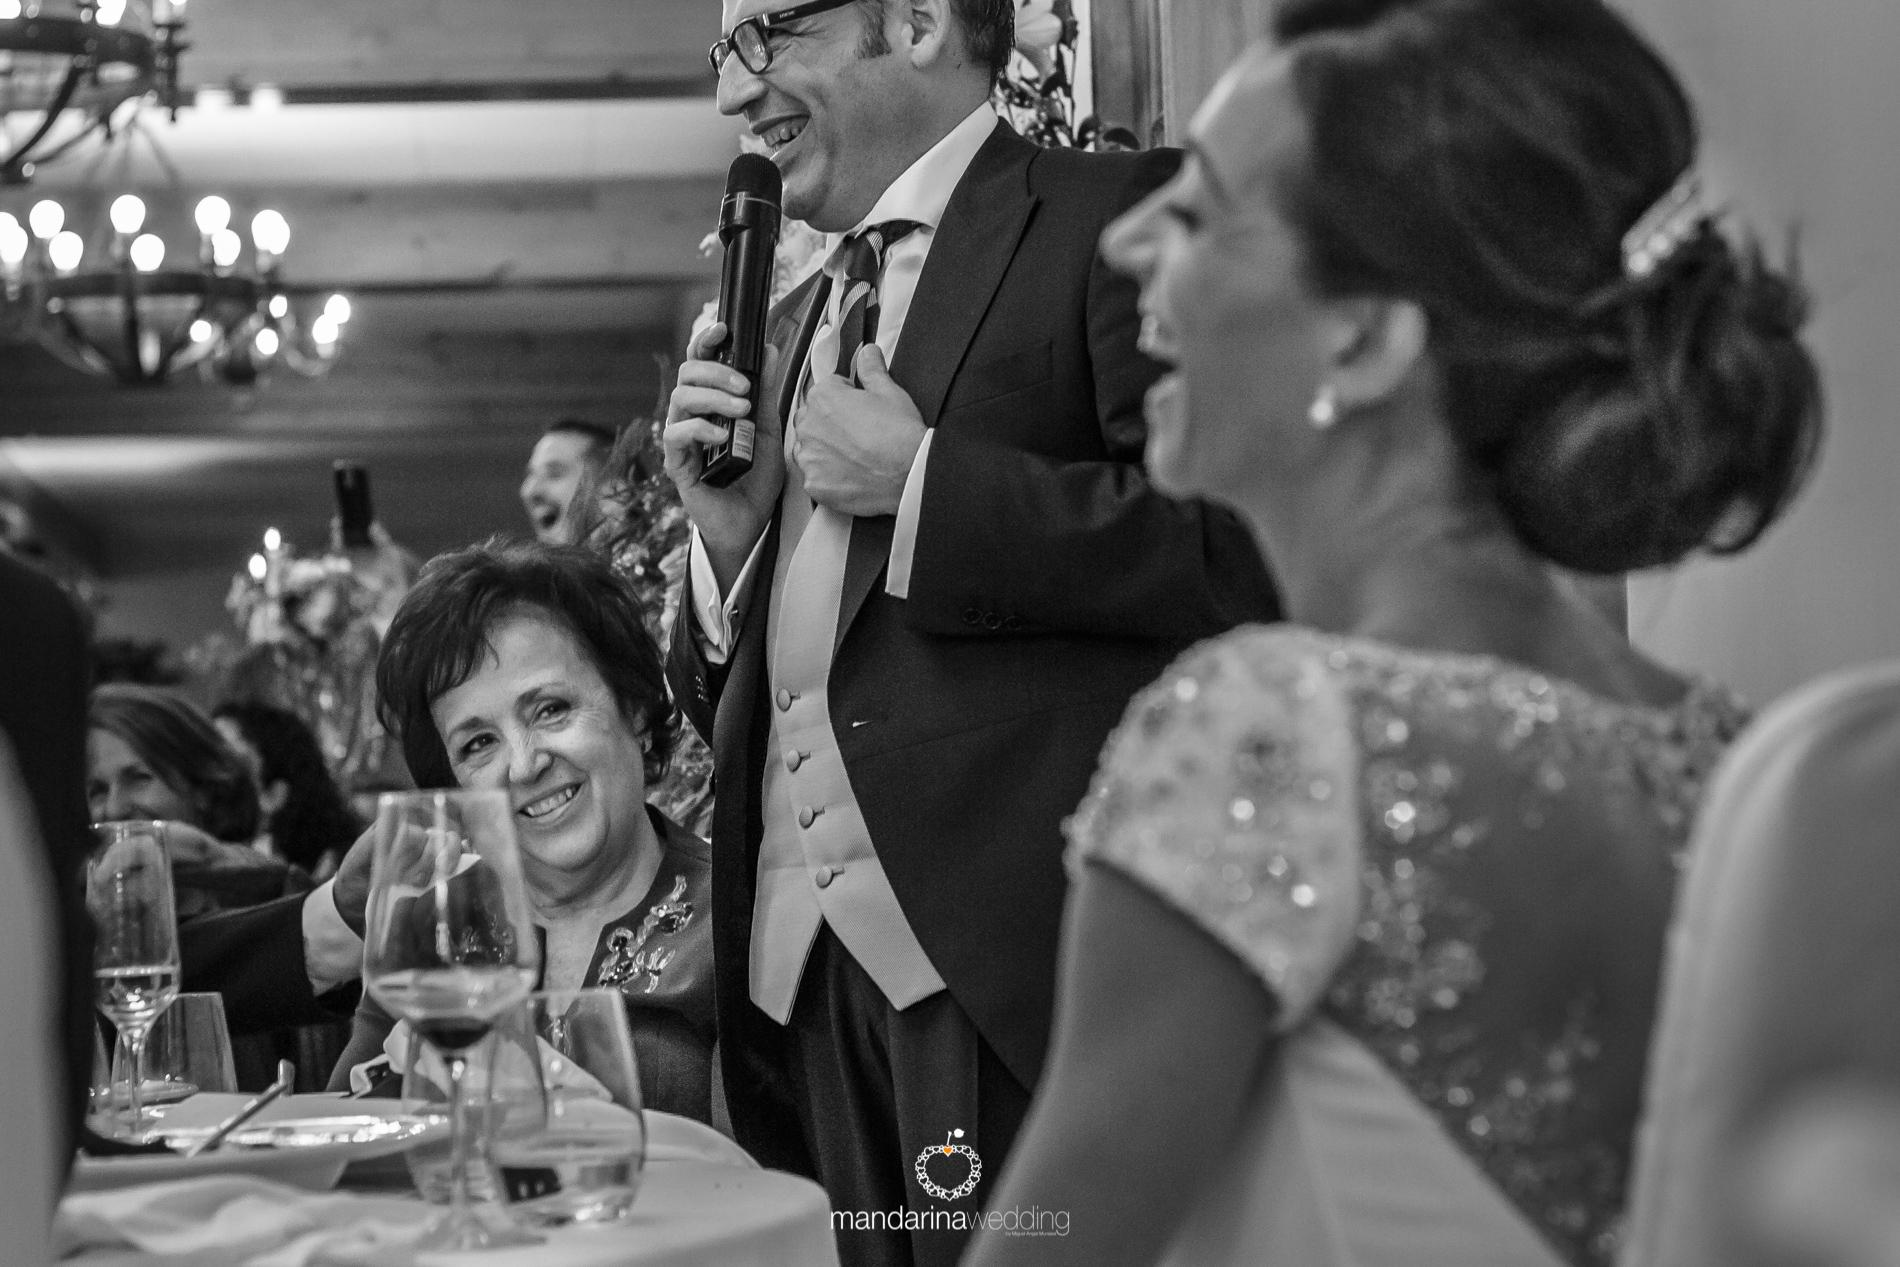 mandaria wedding, fotografos de boda, fotoperiodismo de boda, mejores fotografos de boda, bodas soria, bodas pirineo, bodas Madrid, fotógrafos tarragona_24